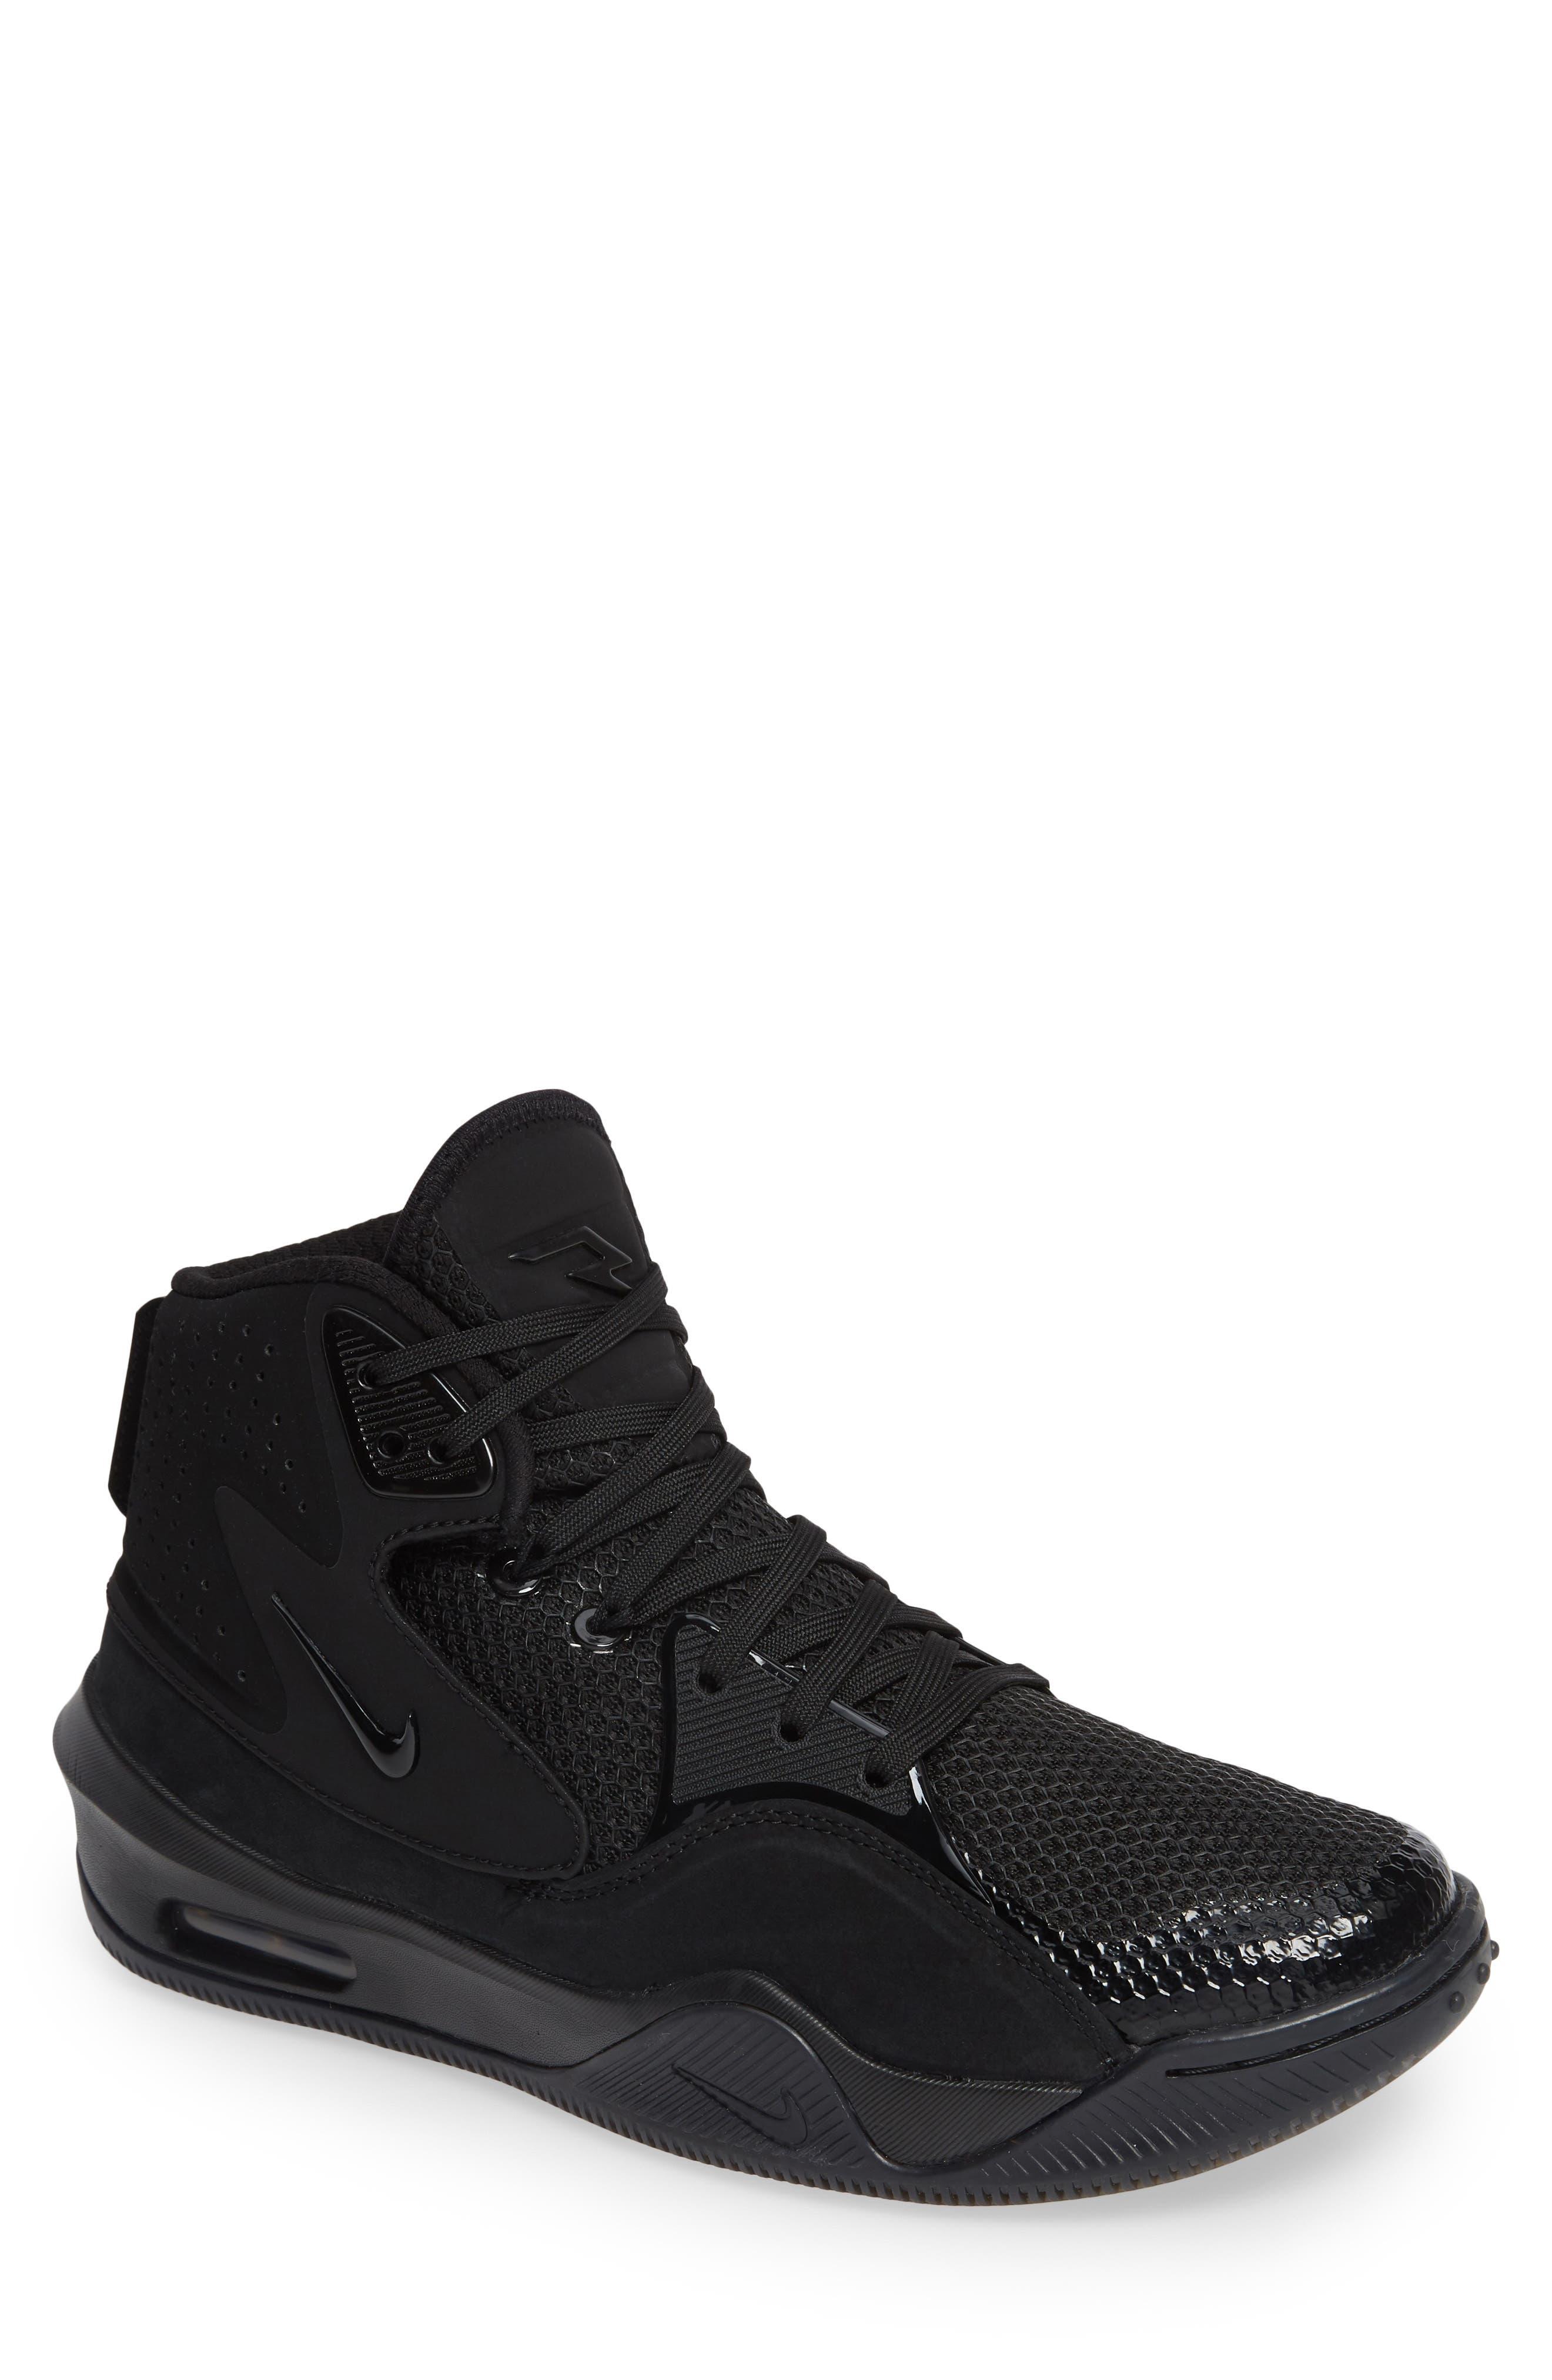 Dangeruss Wilson 1 Sneaker,                         Main,                         color, BLACK/ METALLIC GOLD